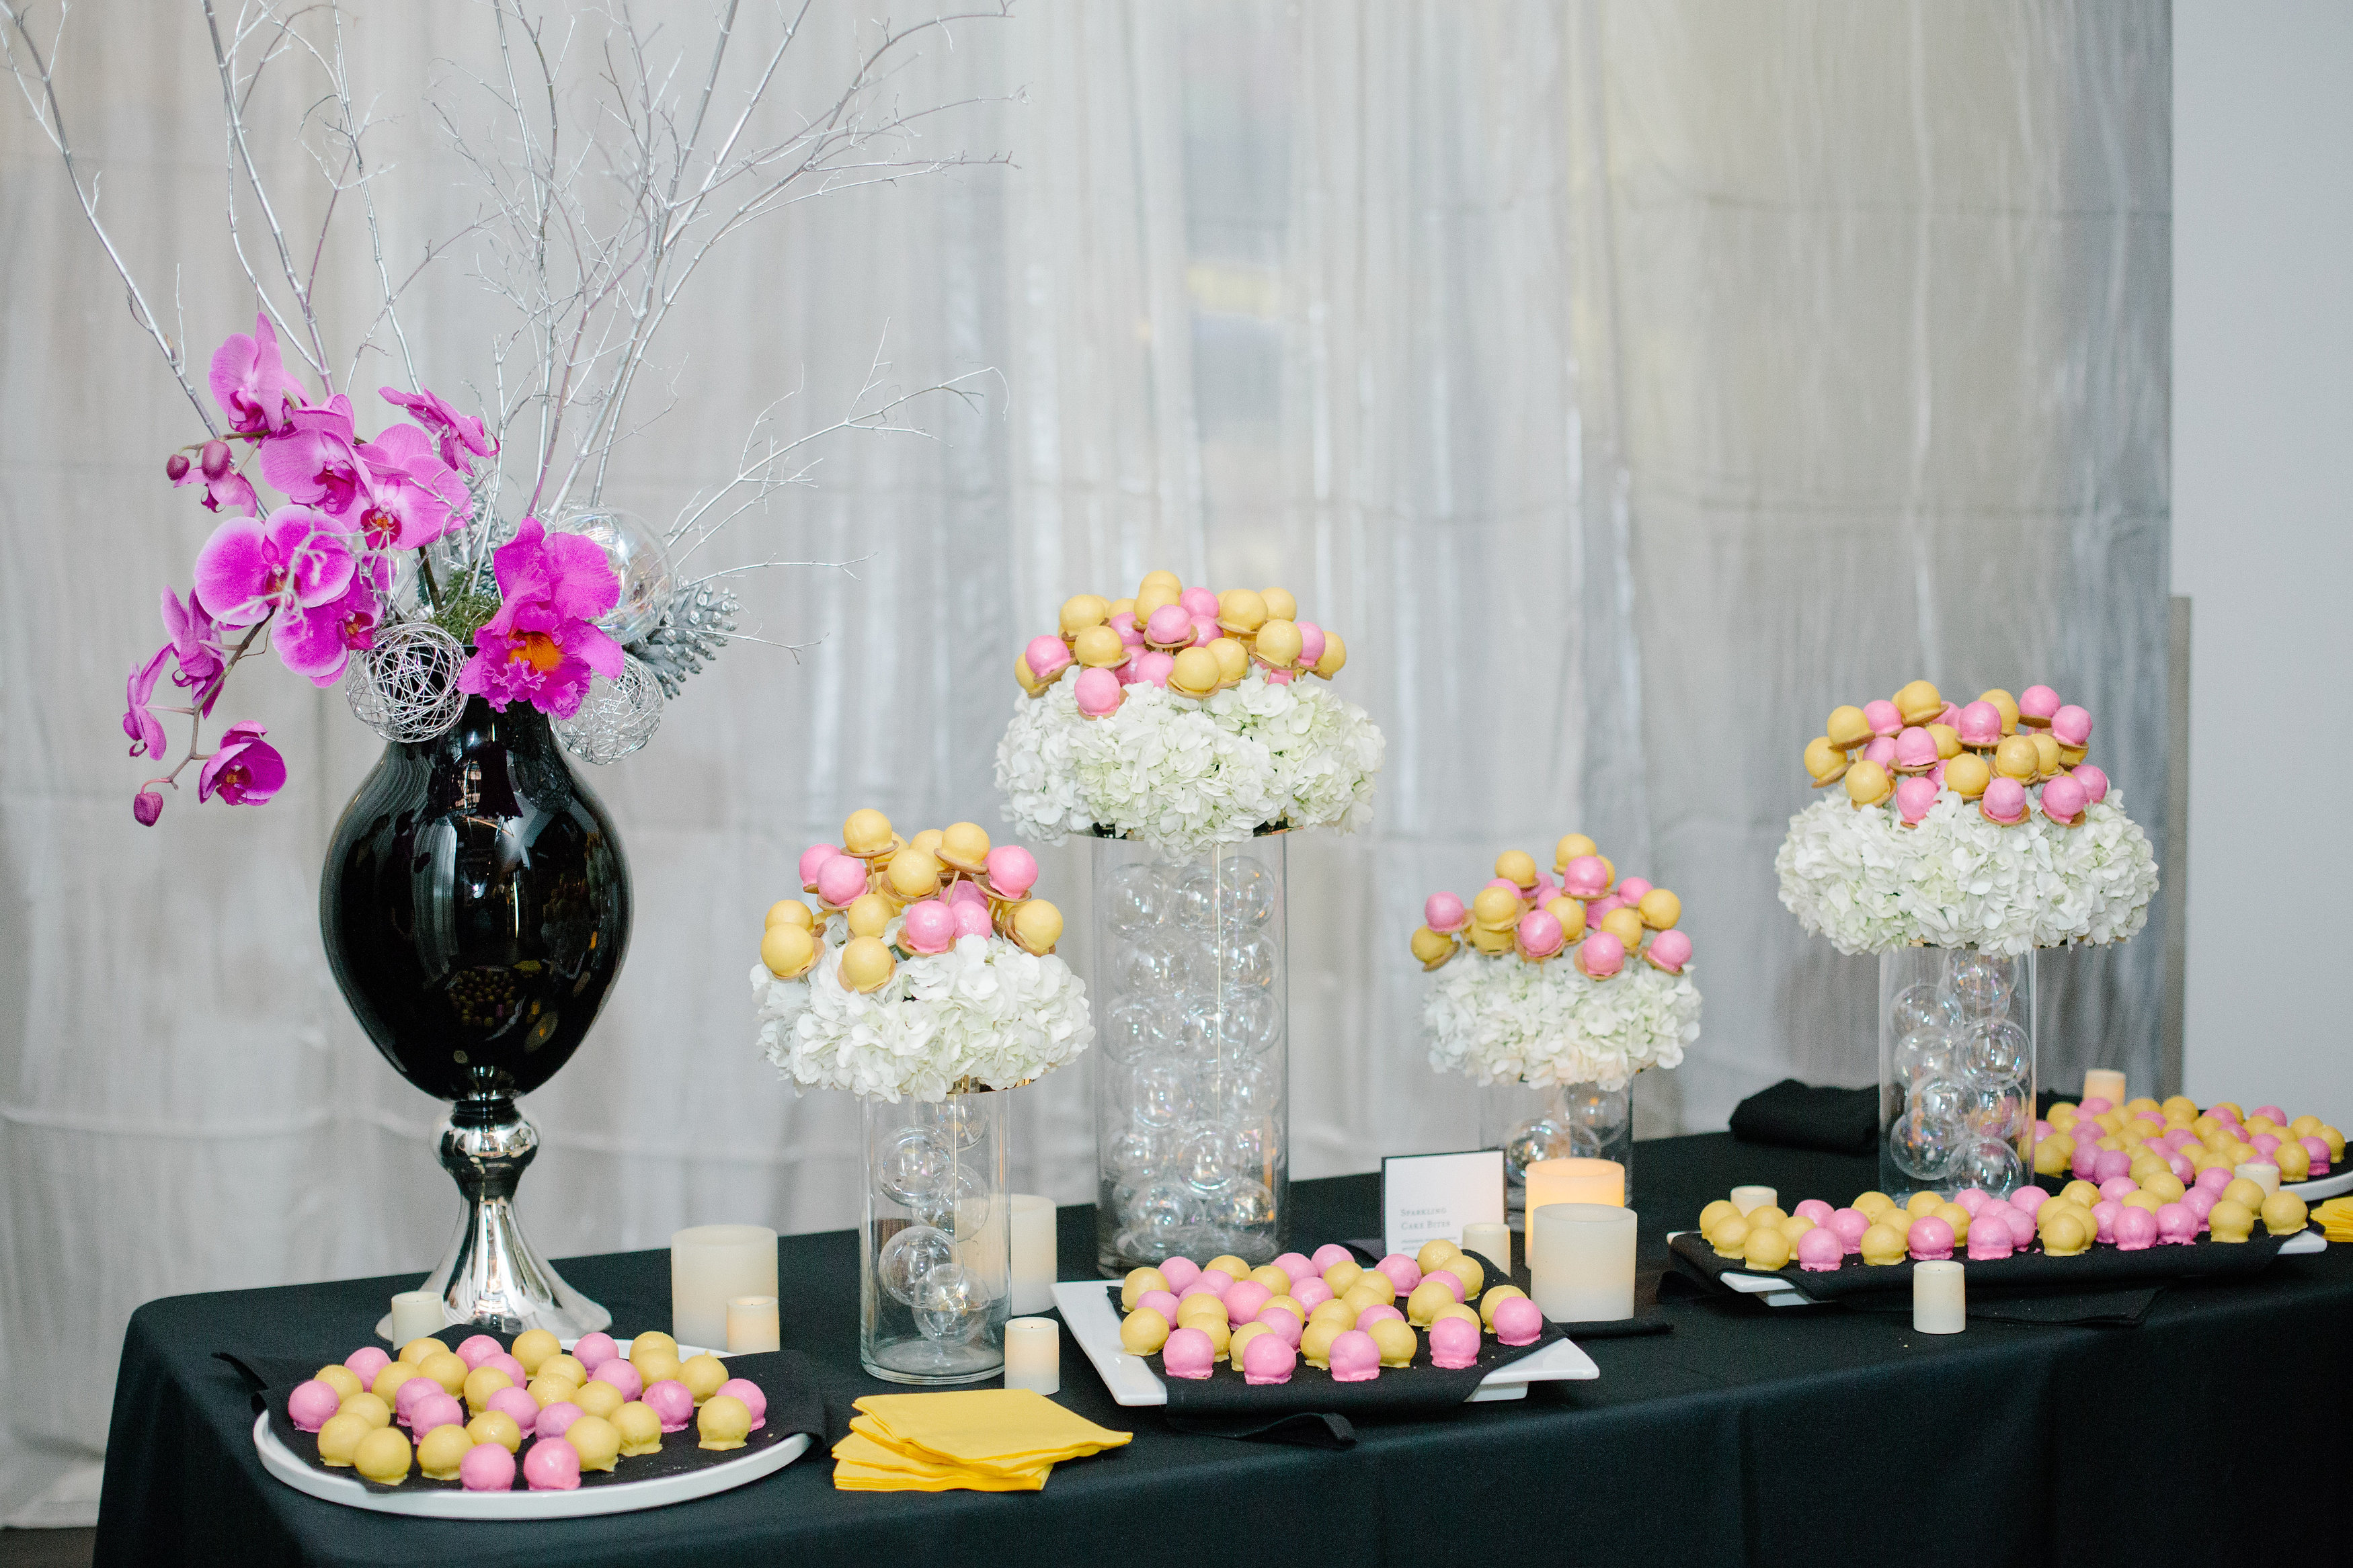 Champagne tasting event